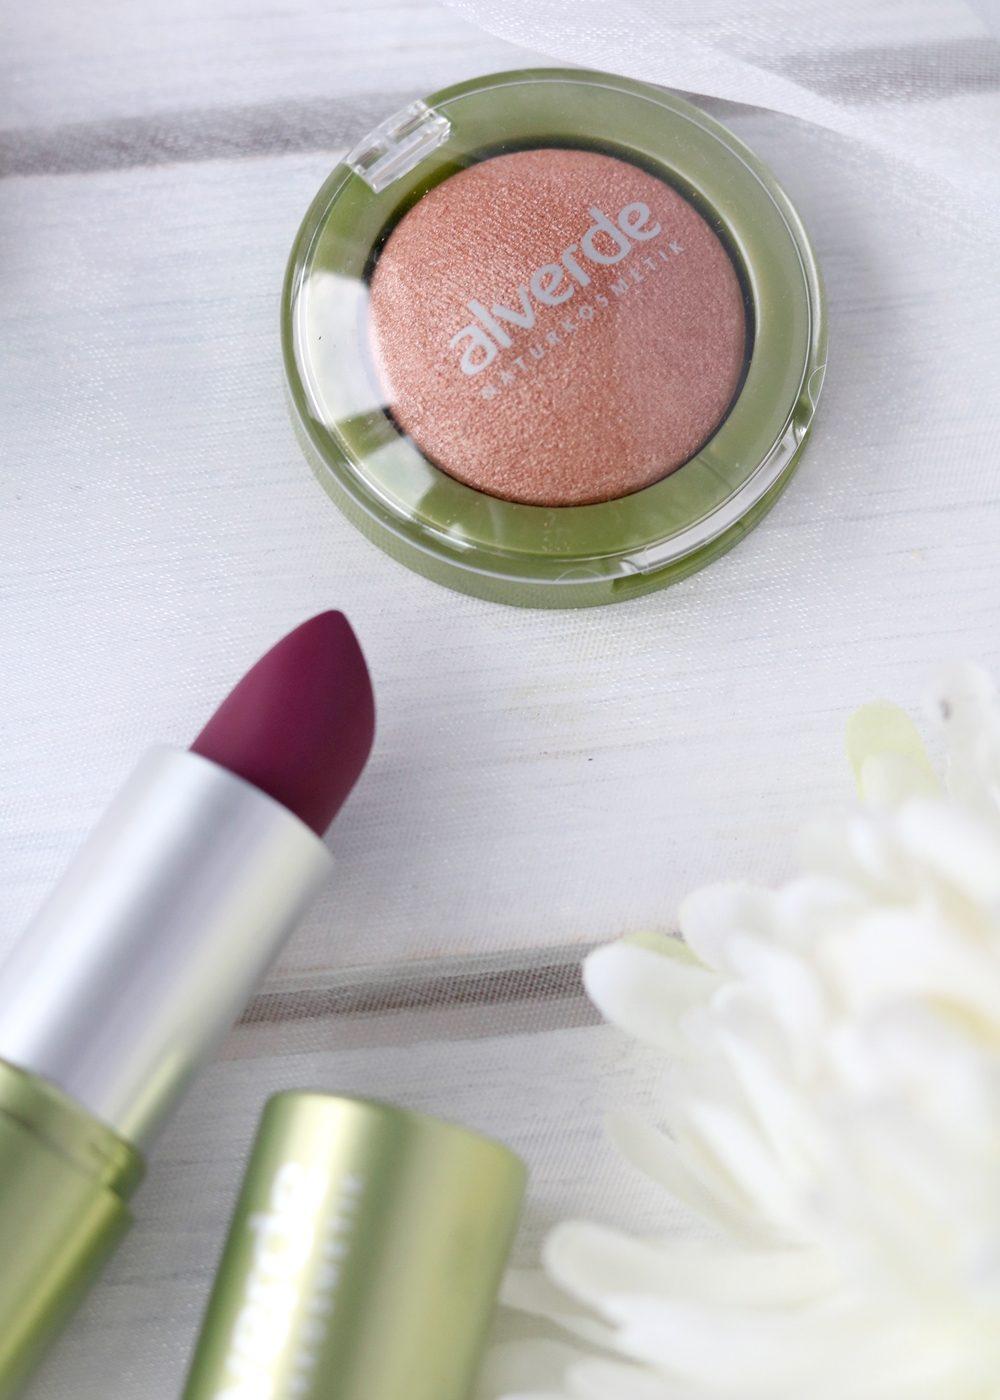 Alverde Make Up (5)